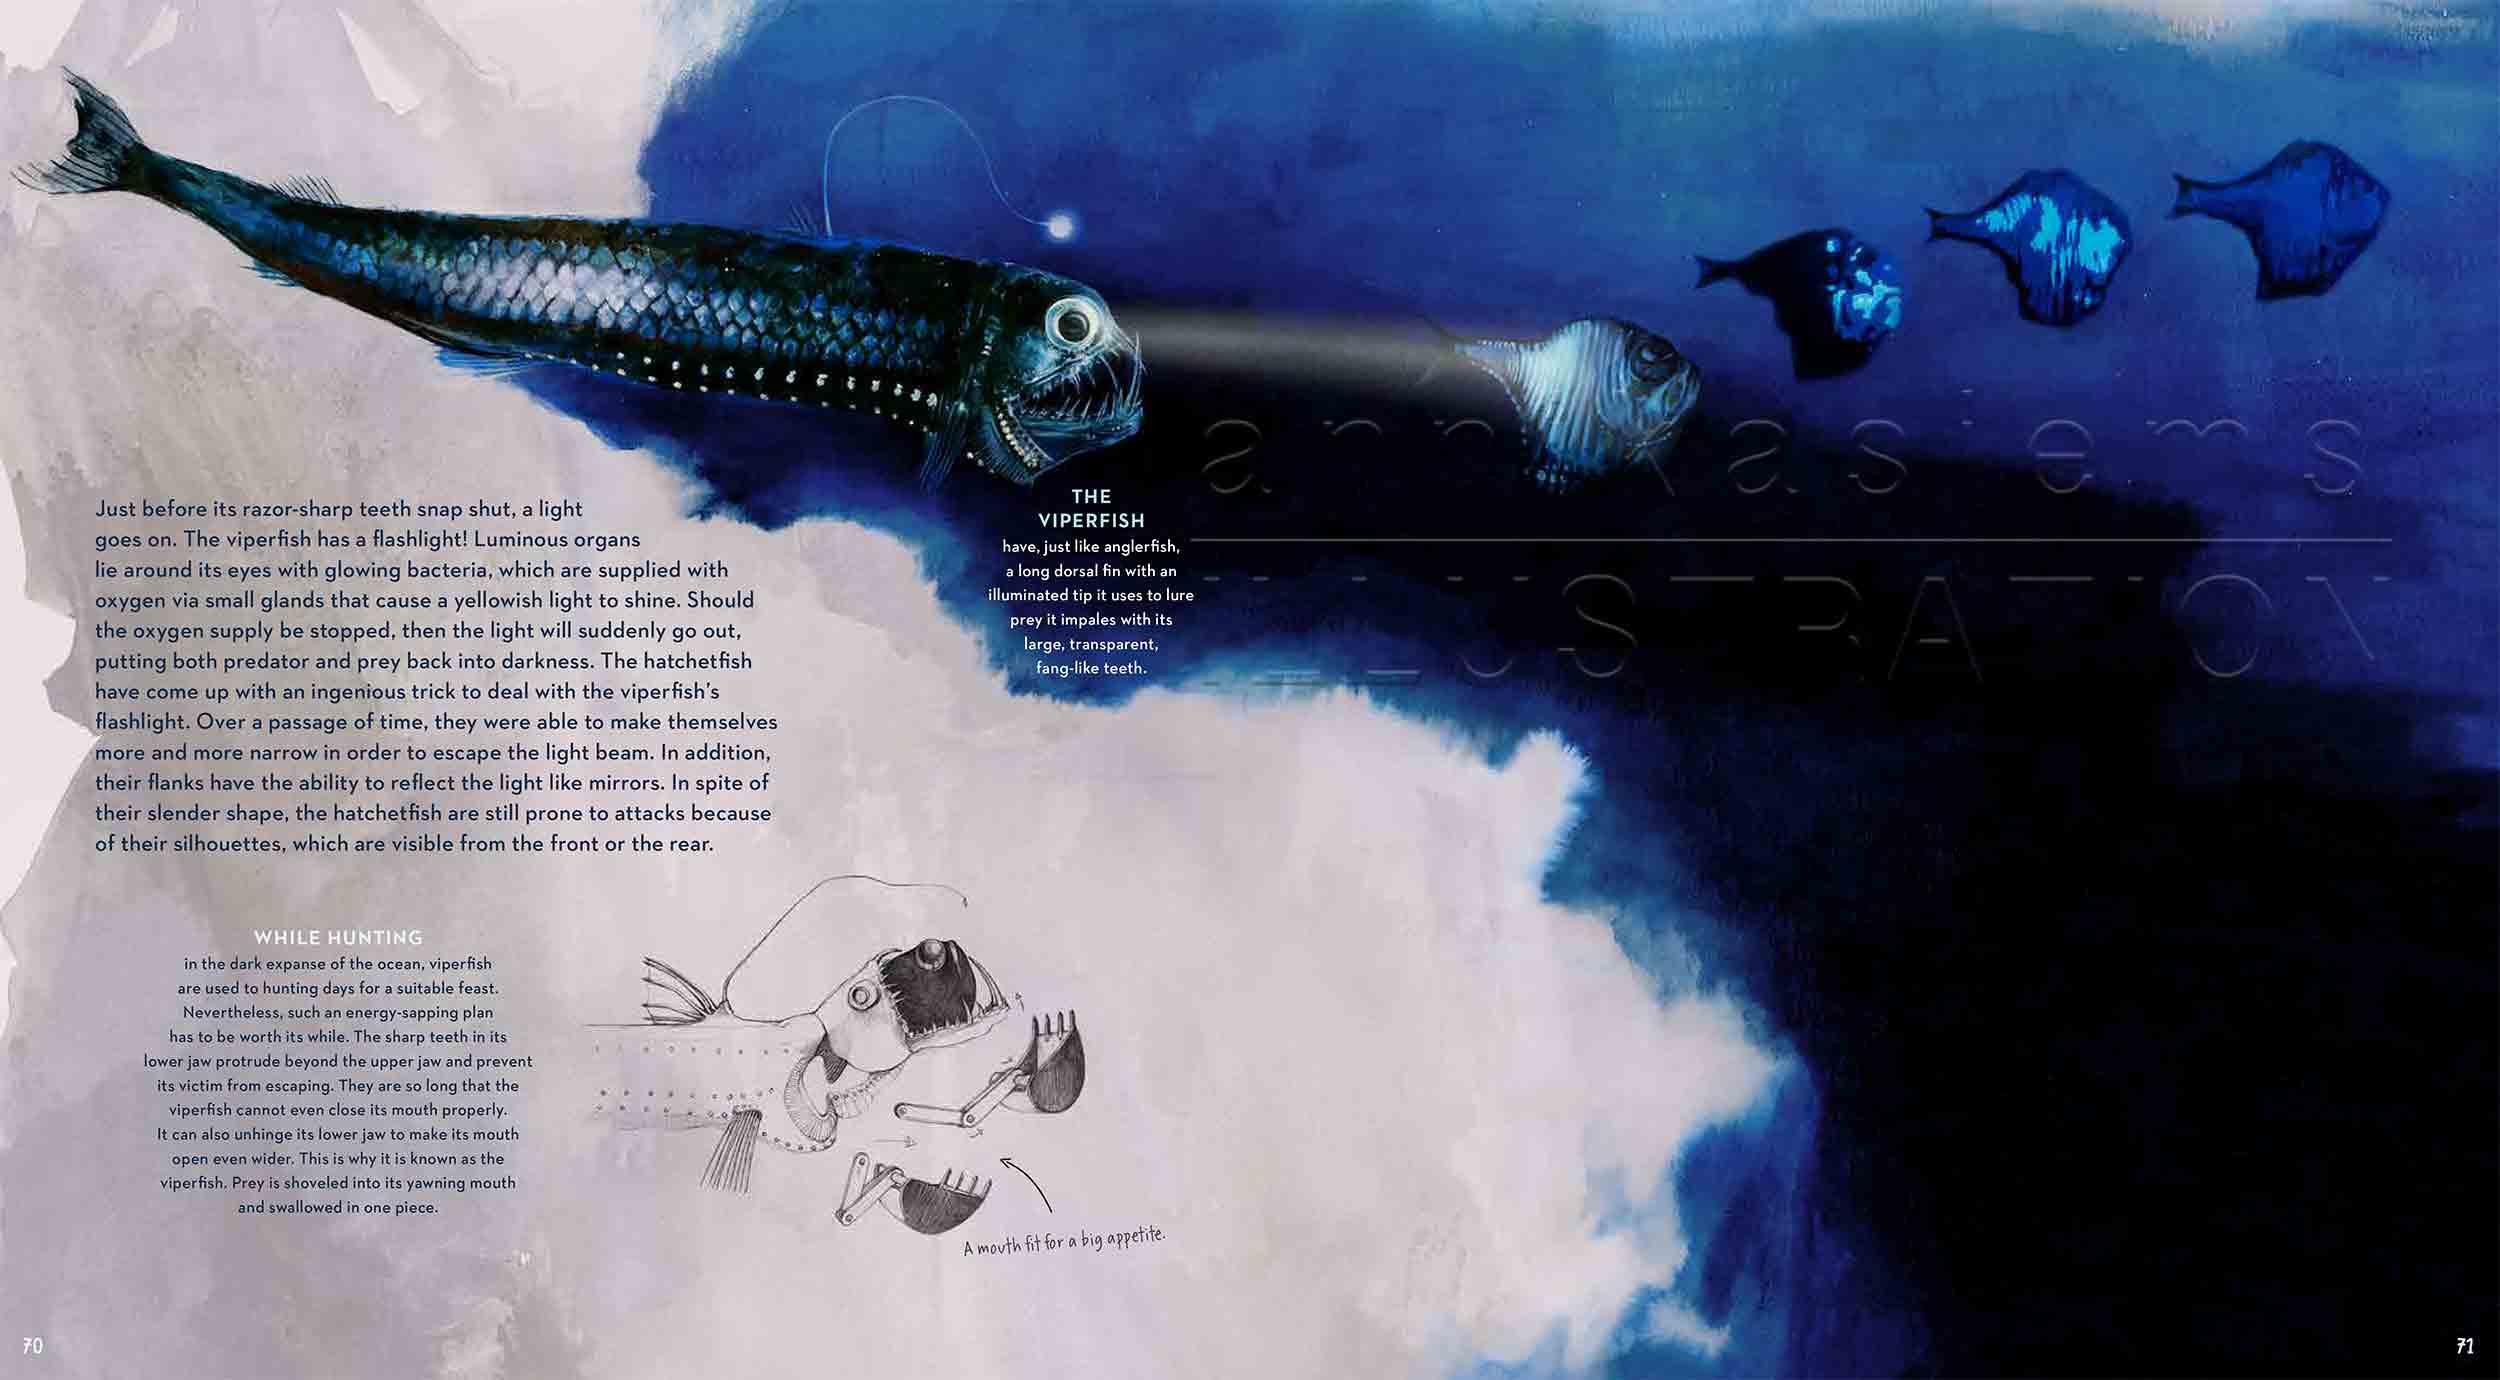 70-71-hedgefish-viperfish-deep-sea-Englisch-submersible-©annikasiems-plankton_deepsea-zooplankton.jpg